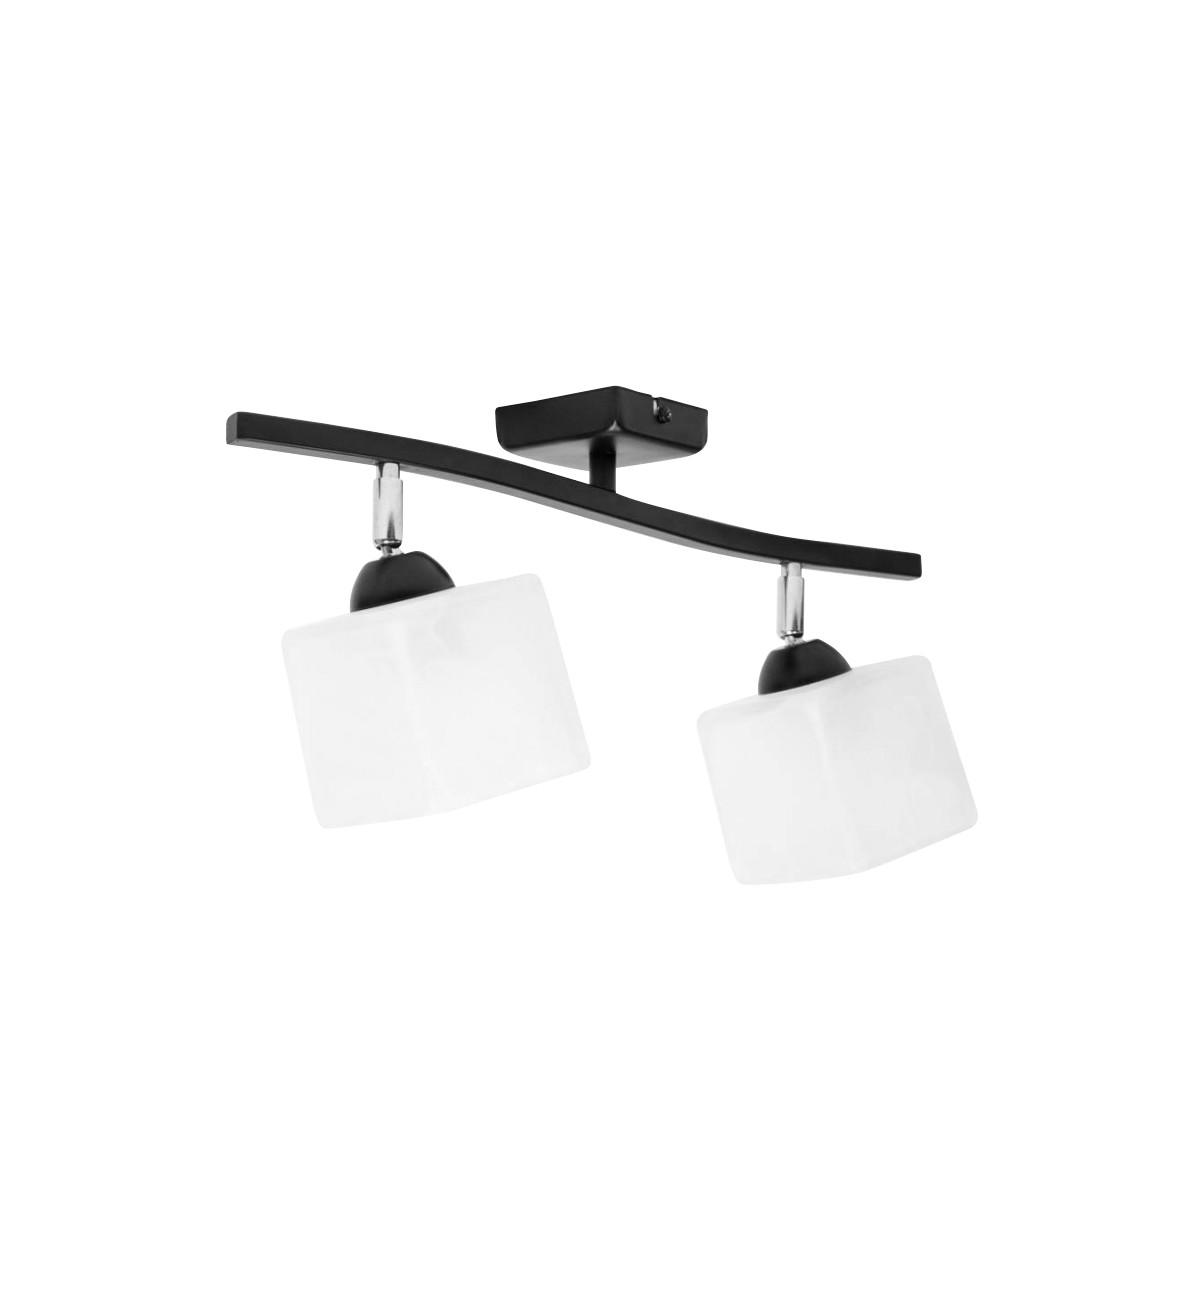 lampa plafon sufitowa 2 plomienna glass 2